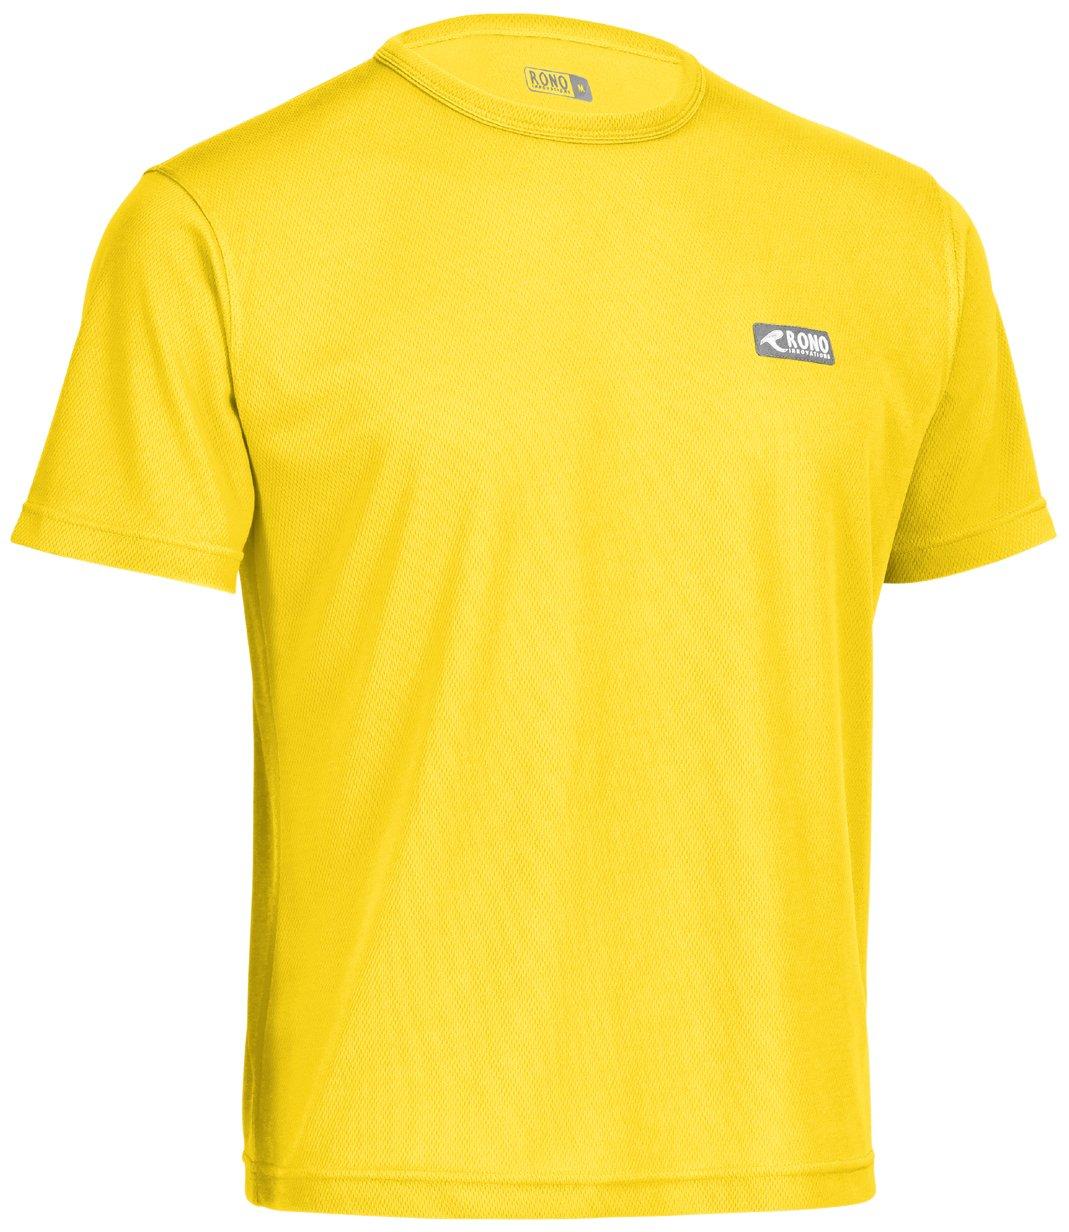 Rono Shirt-Ki-Minimesh - Camiseta